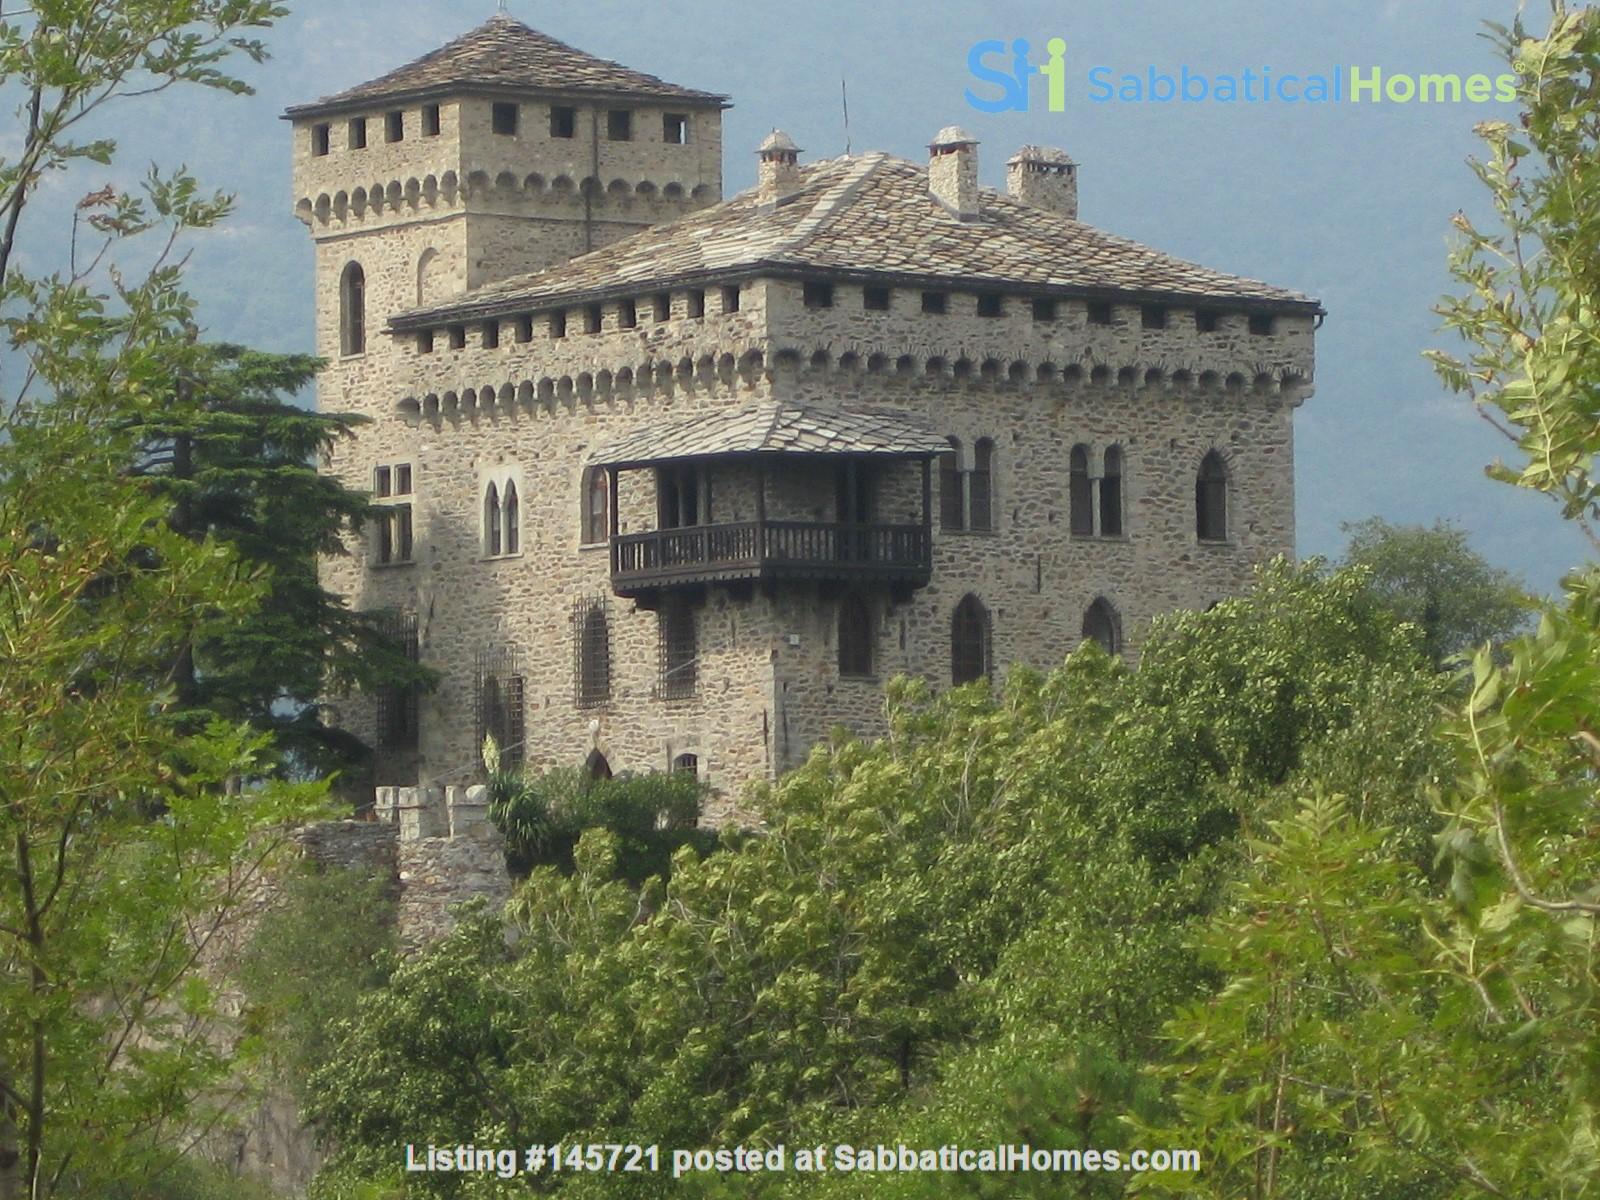 Romantic Italian castle at the foot of the Alps in Piemonte, Italy Home Rental in Città Metropolitana di Torino, Piemonte, Italy 0